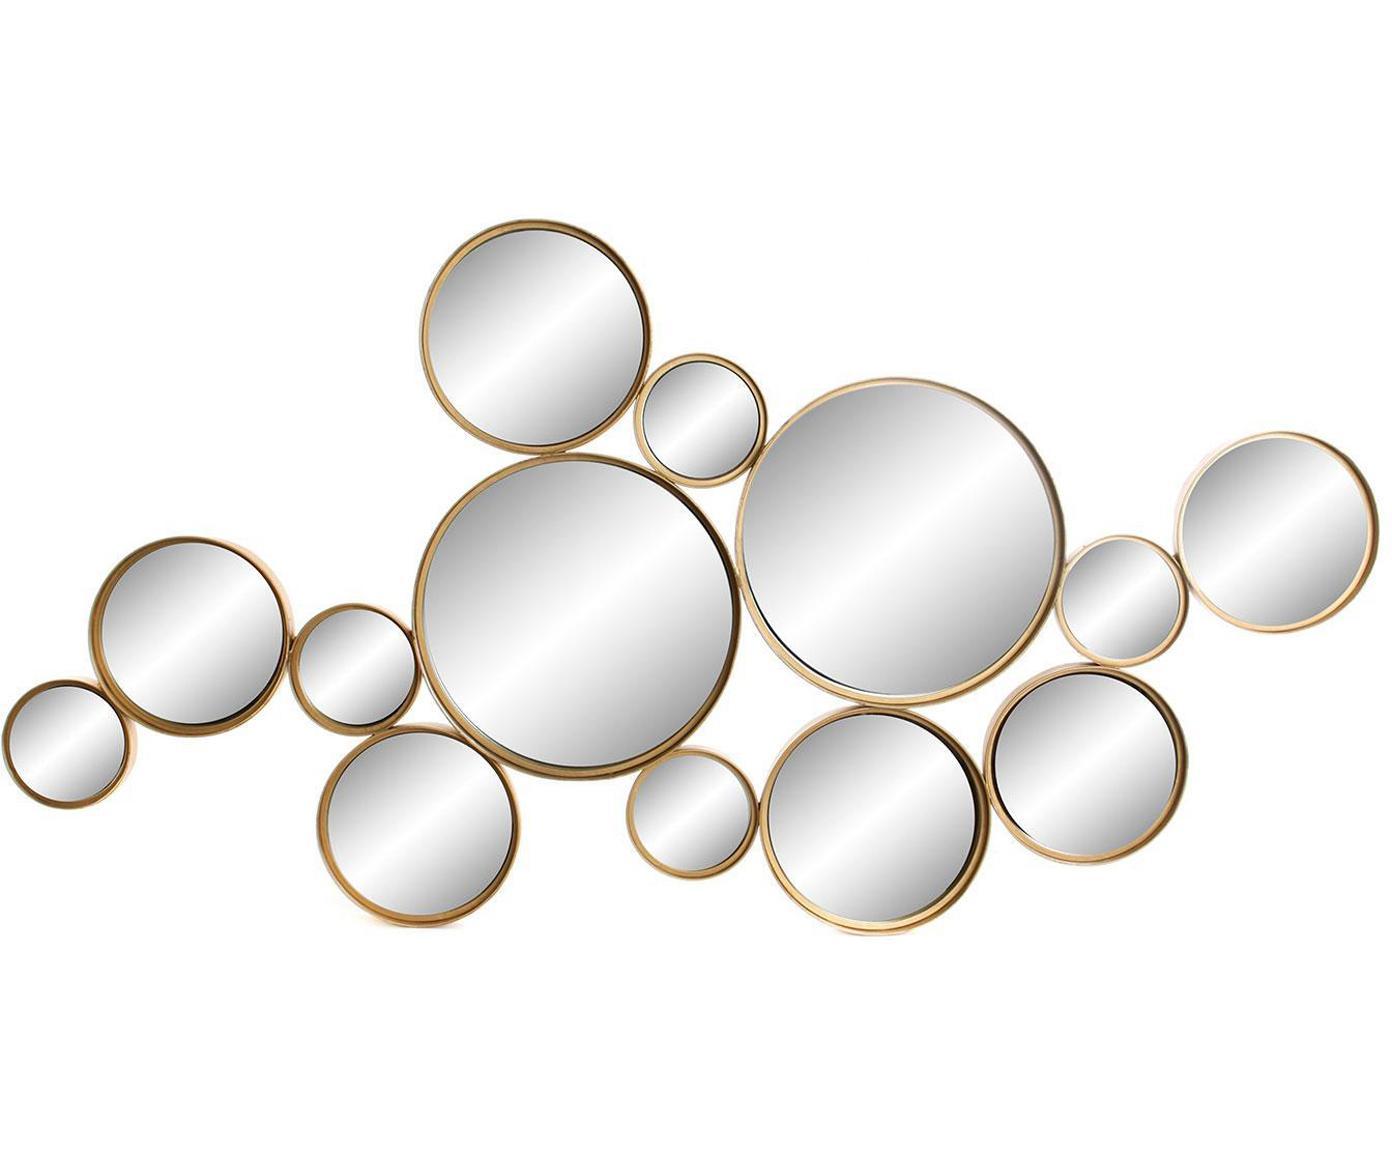 Espejo de pared Bubbles, Dorado, An 126 x Al 66 cm